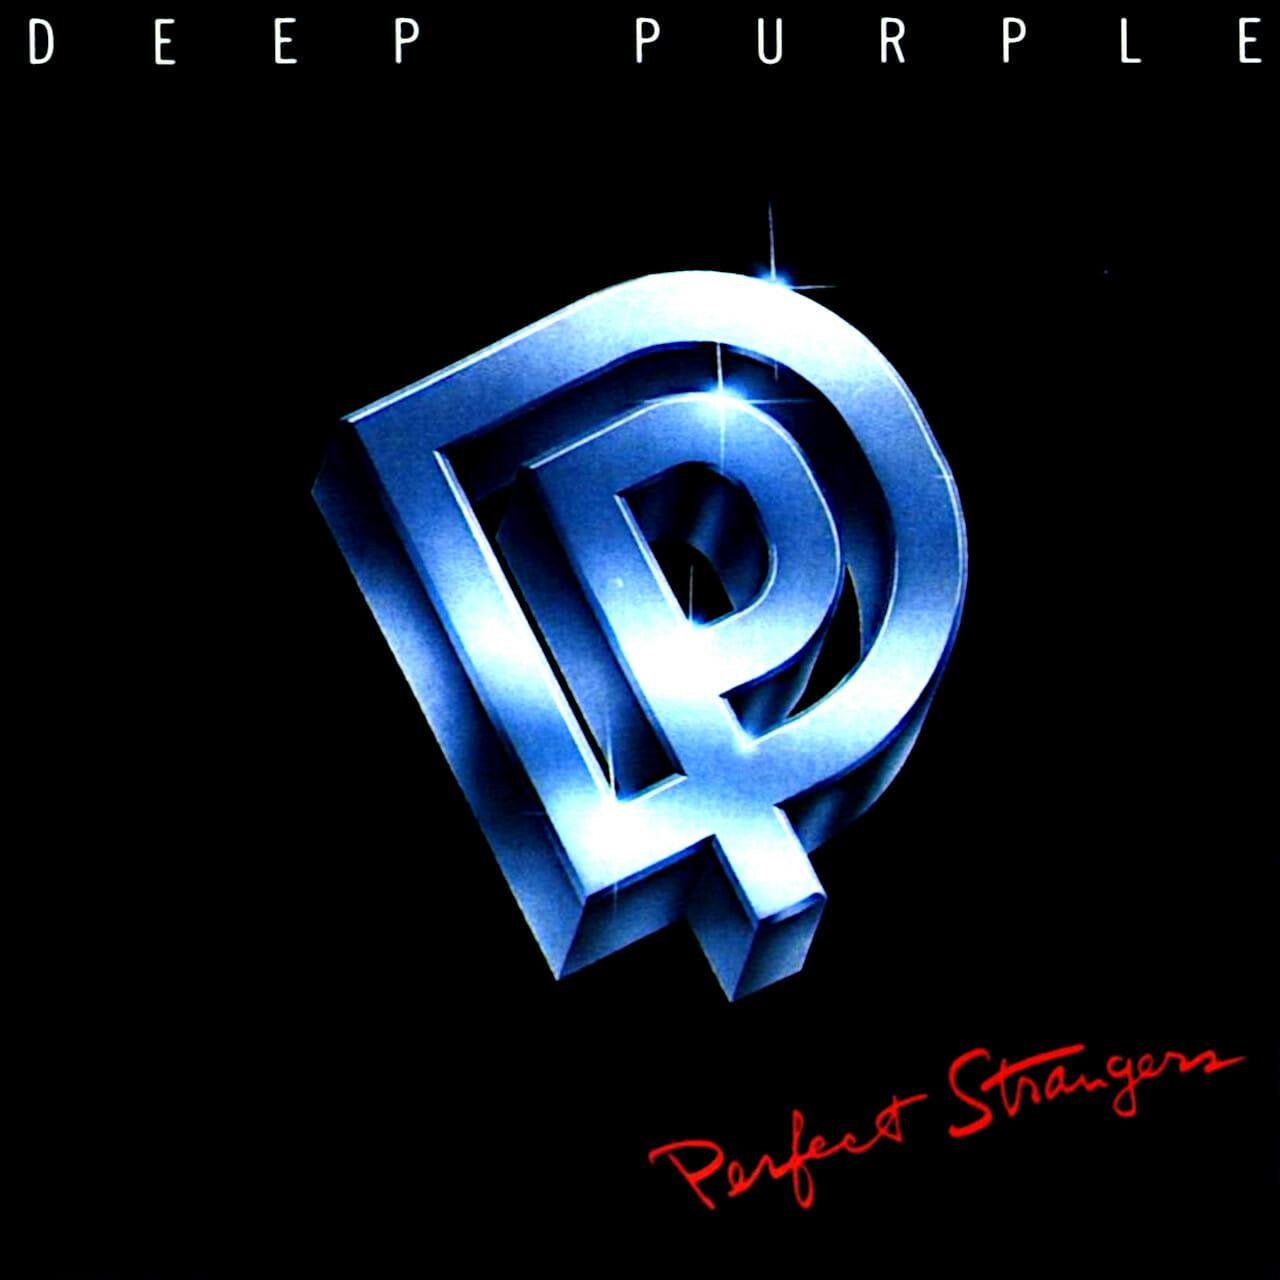 Deep Purple Perfec Strangers